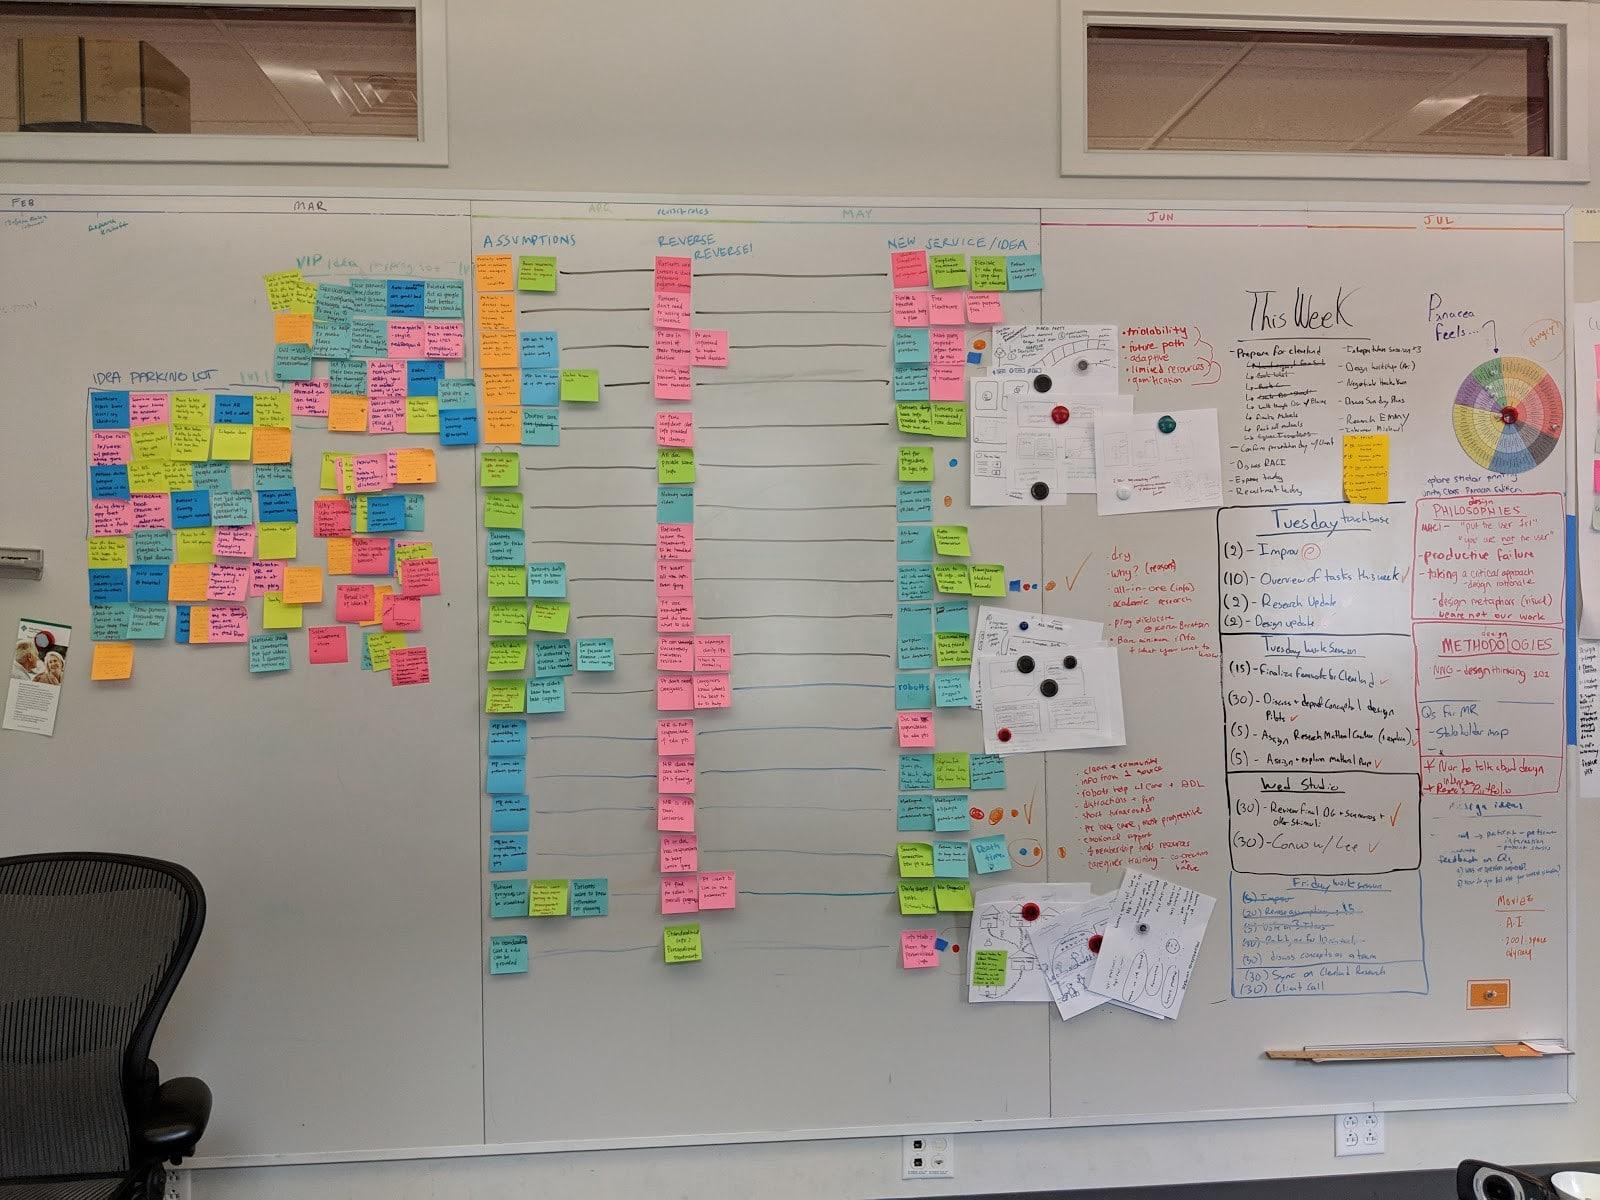 UX Design Comportemental, post-it